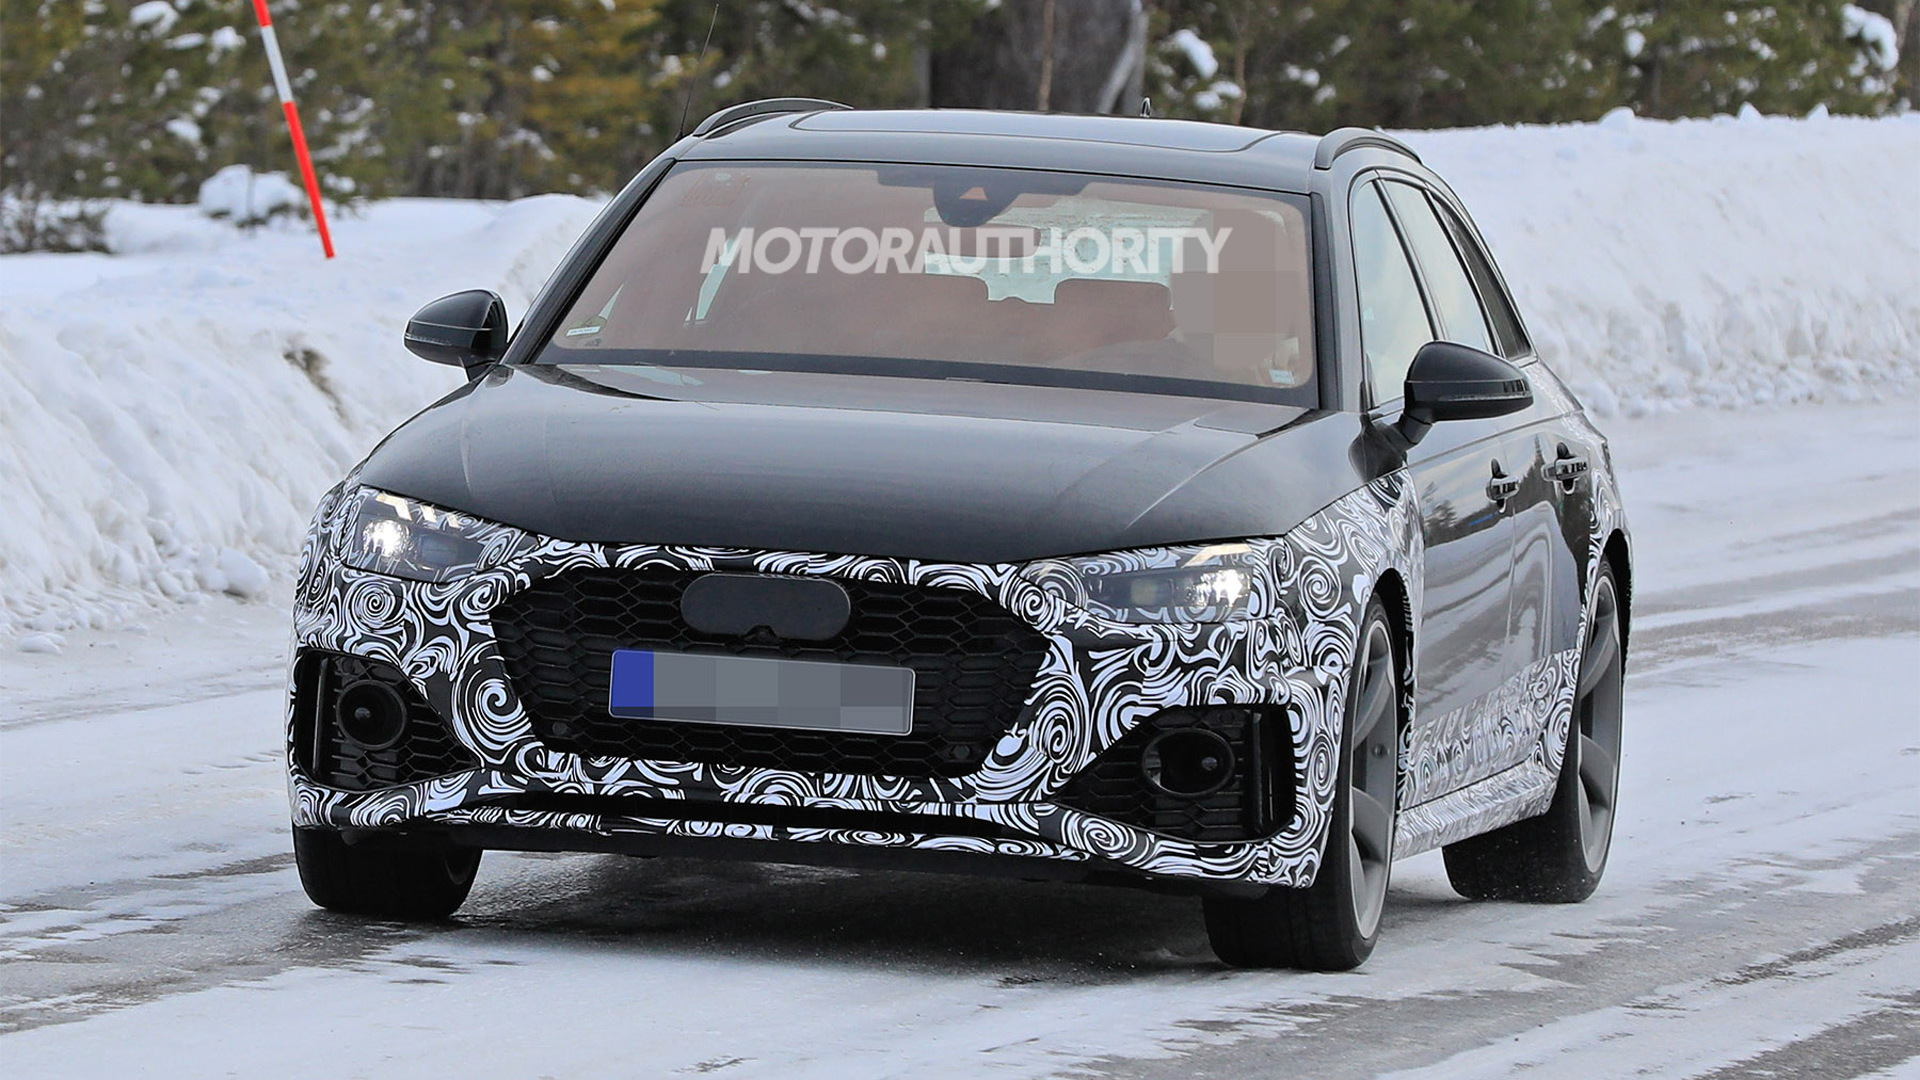 2021 Audi RS 4 Avant facelift spy shots - Image via S. Baldauf/SB-Medien